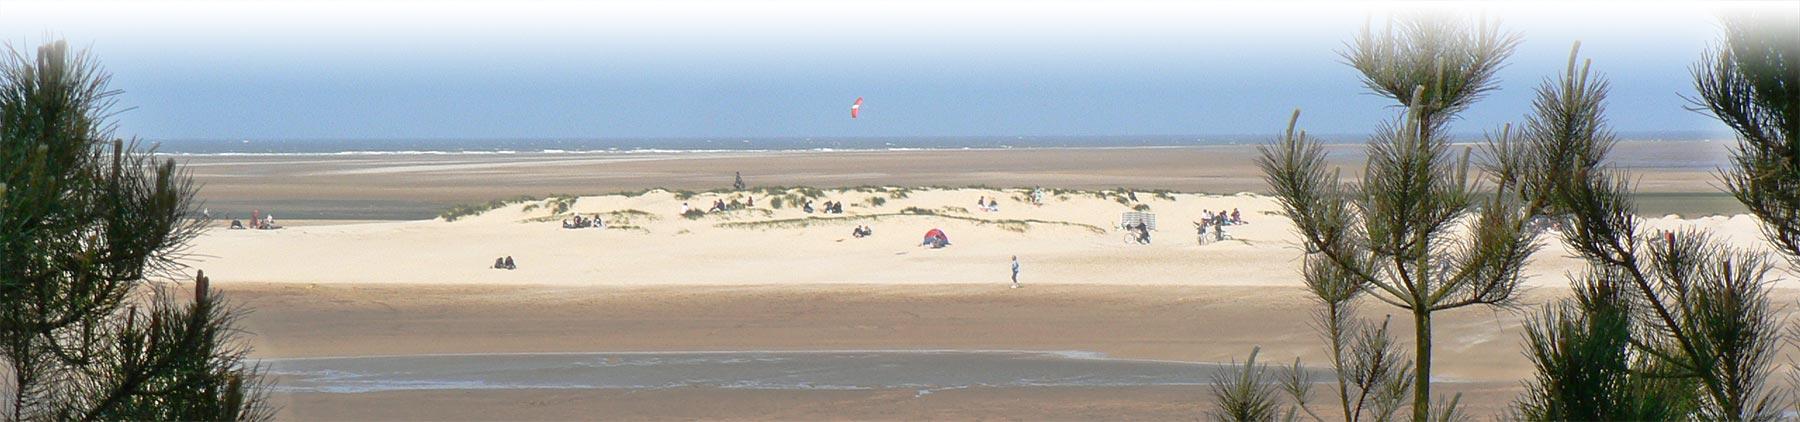 The beach, Wells-next-the-Sea, Norfolk